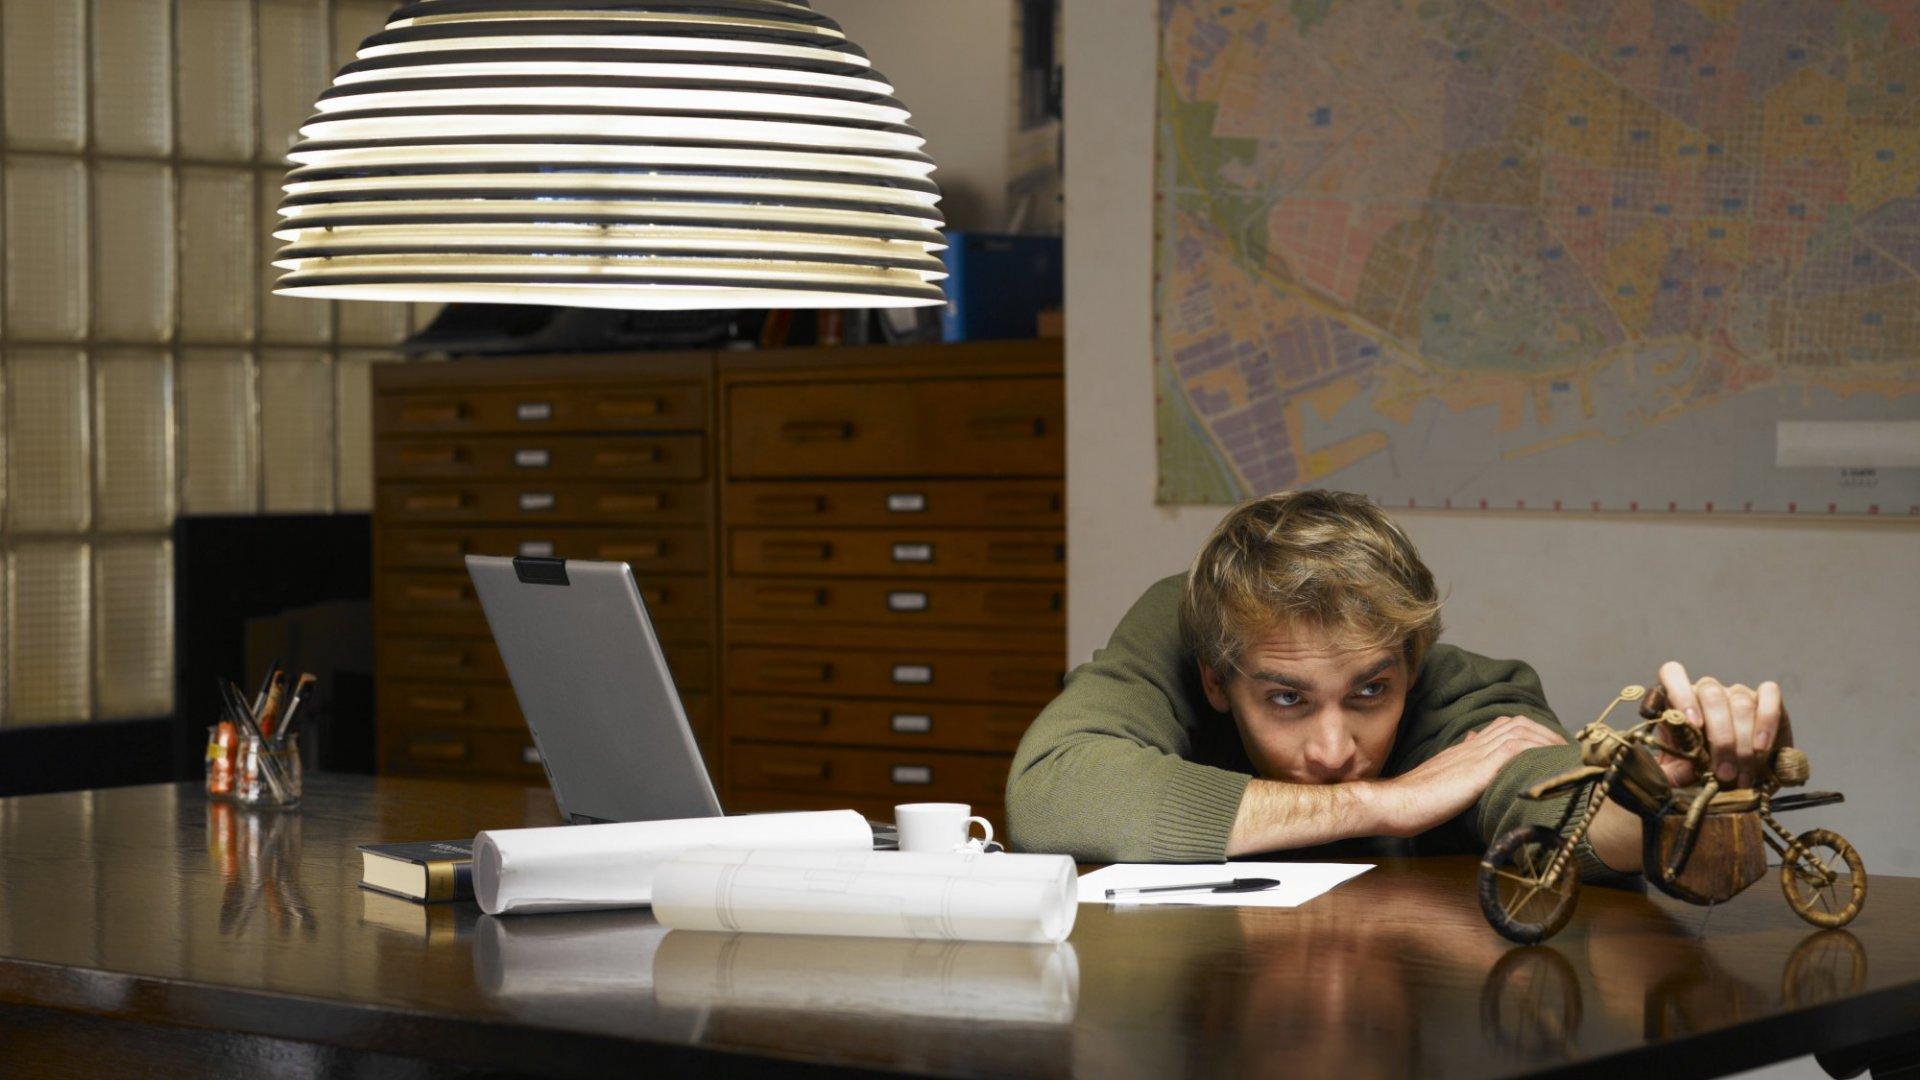 5 Simple Ways to Kill Procrastination Today